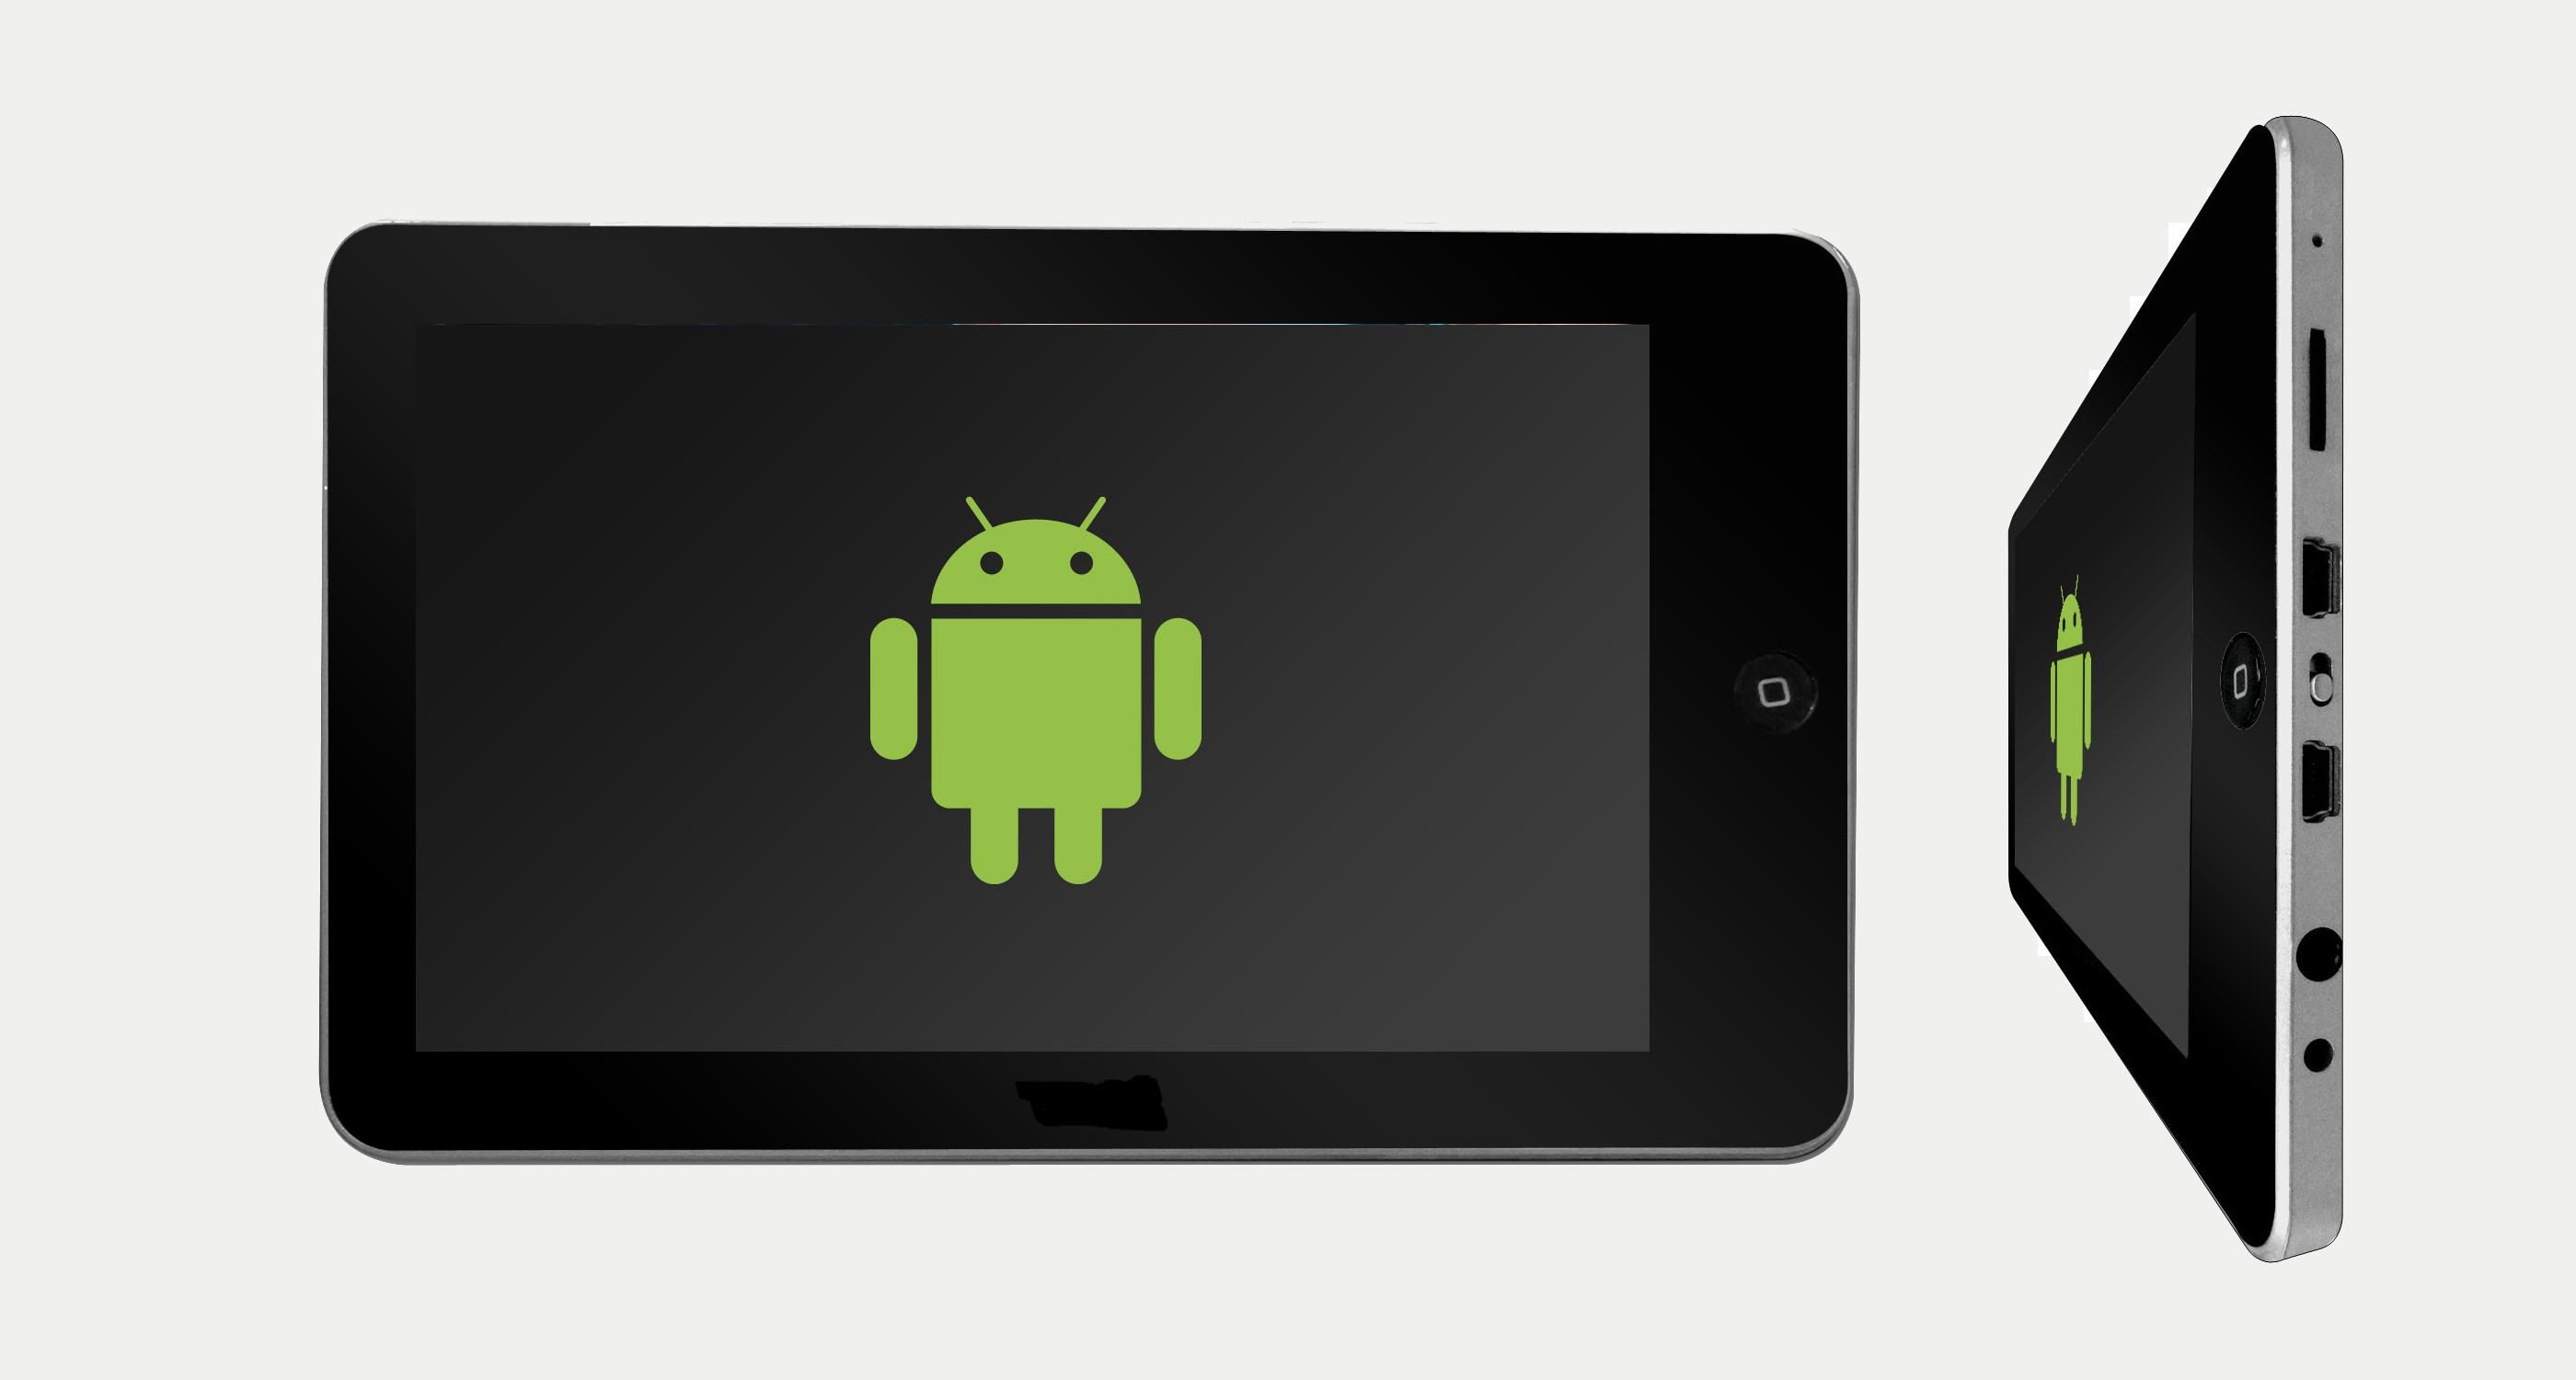 2800x1500 7 inch android tablet wallpaper wallpapersafari